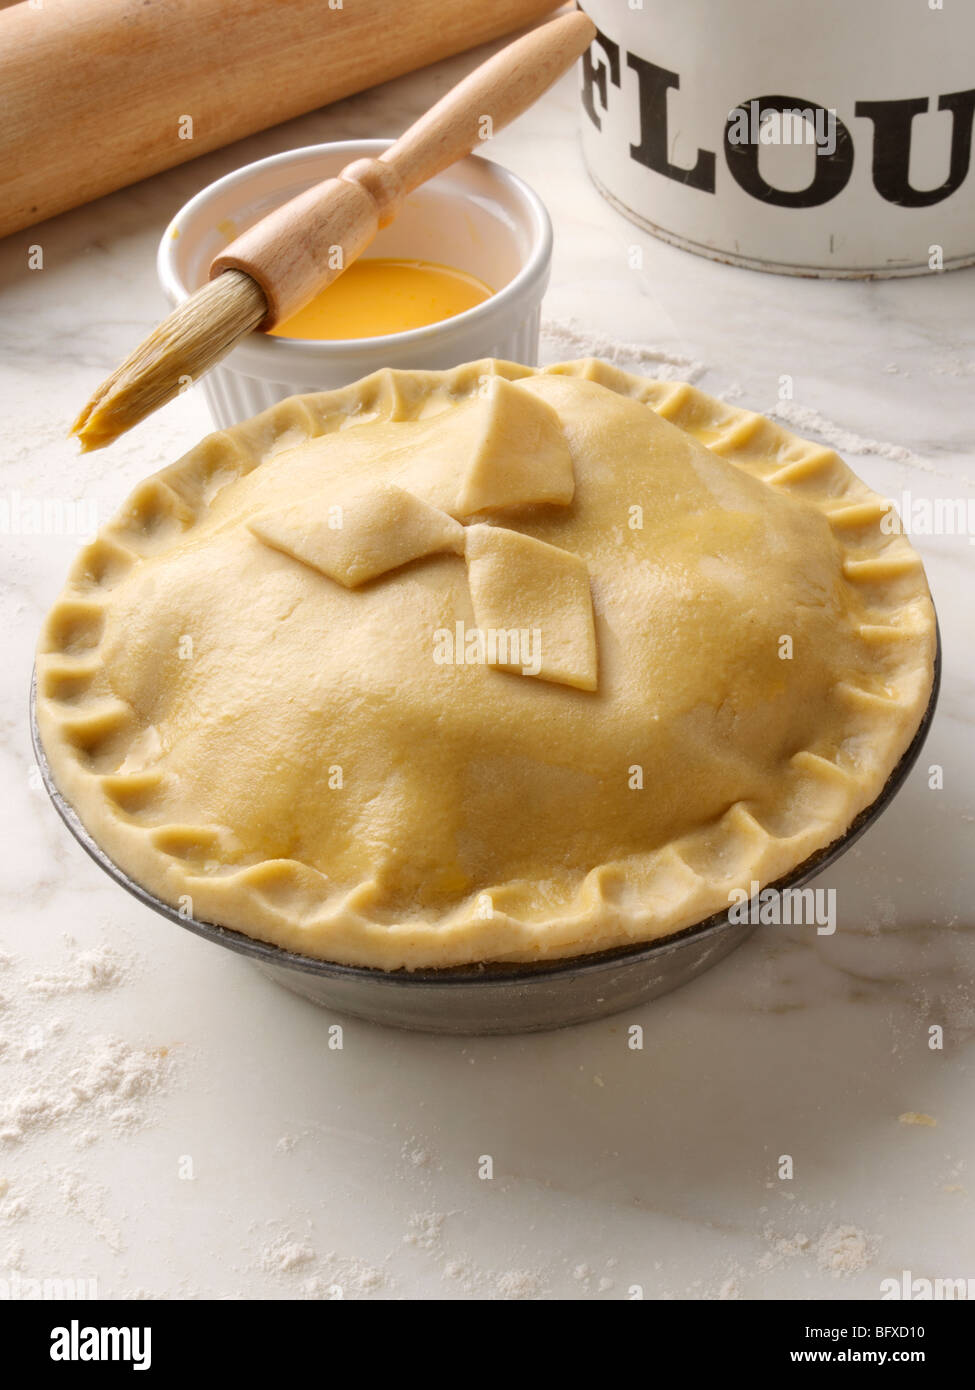 Shortcrust Pastry Pie In A Pie Tin Egg Yolk Brushedh Stock